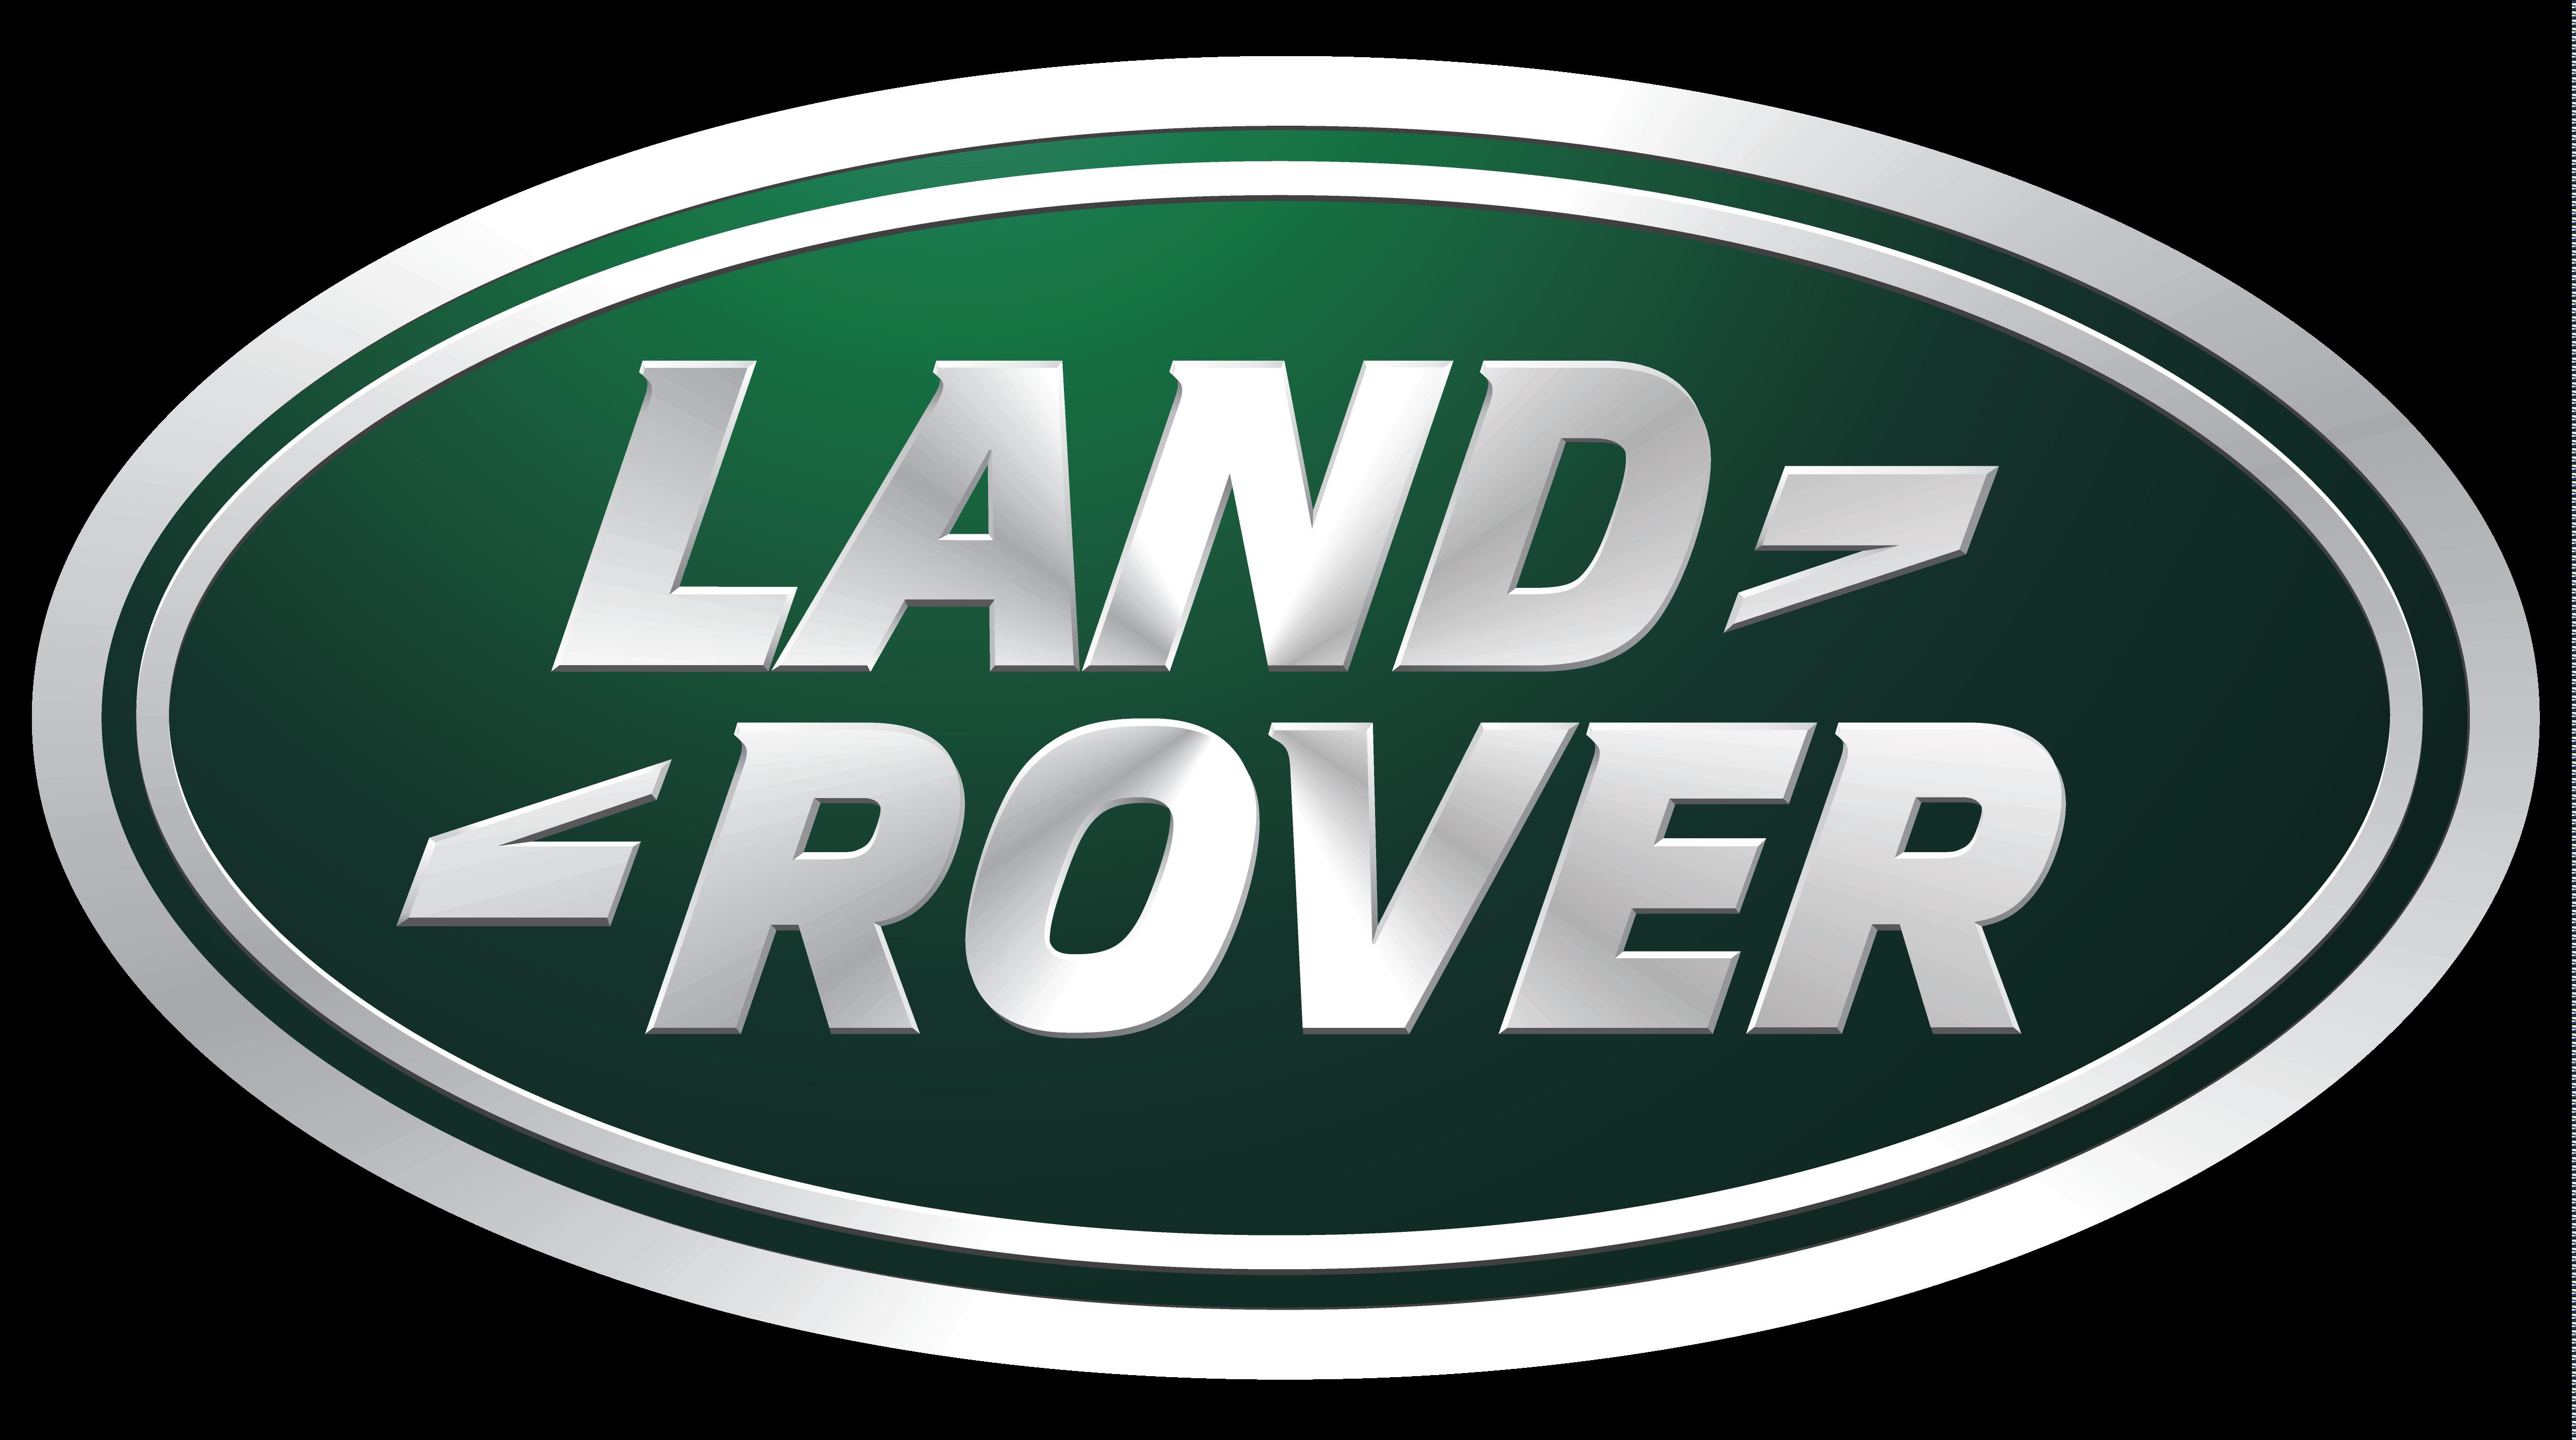 Jaguar land rover logo png - photo#21